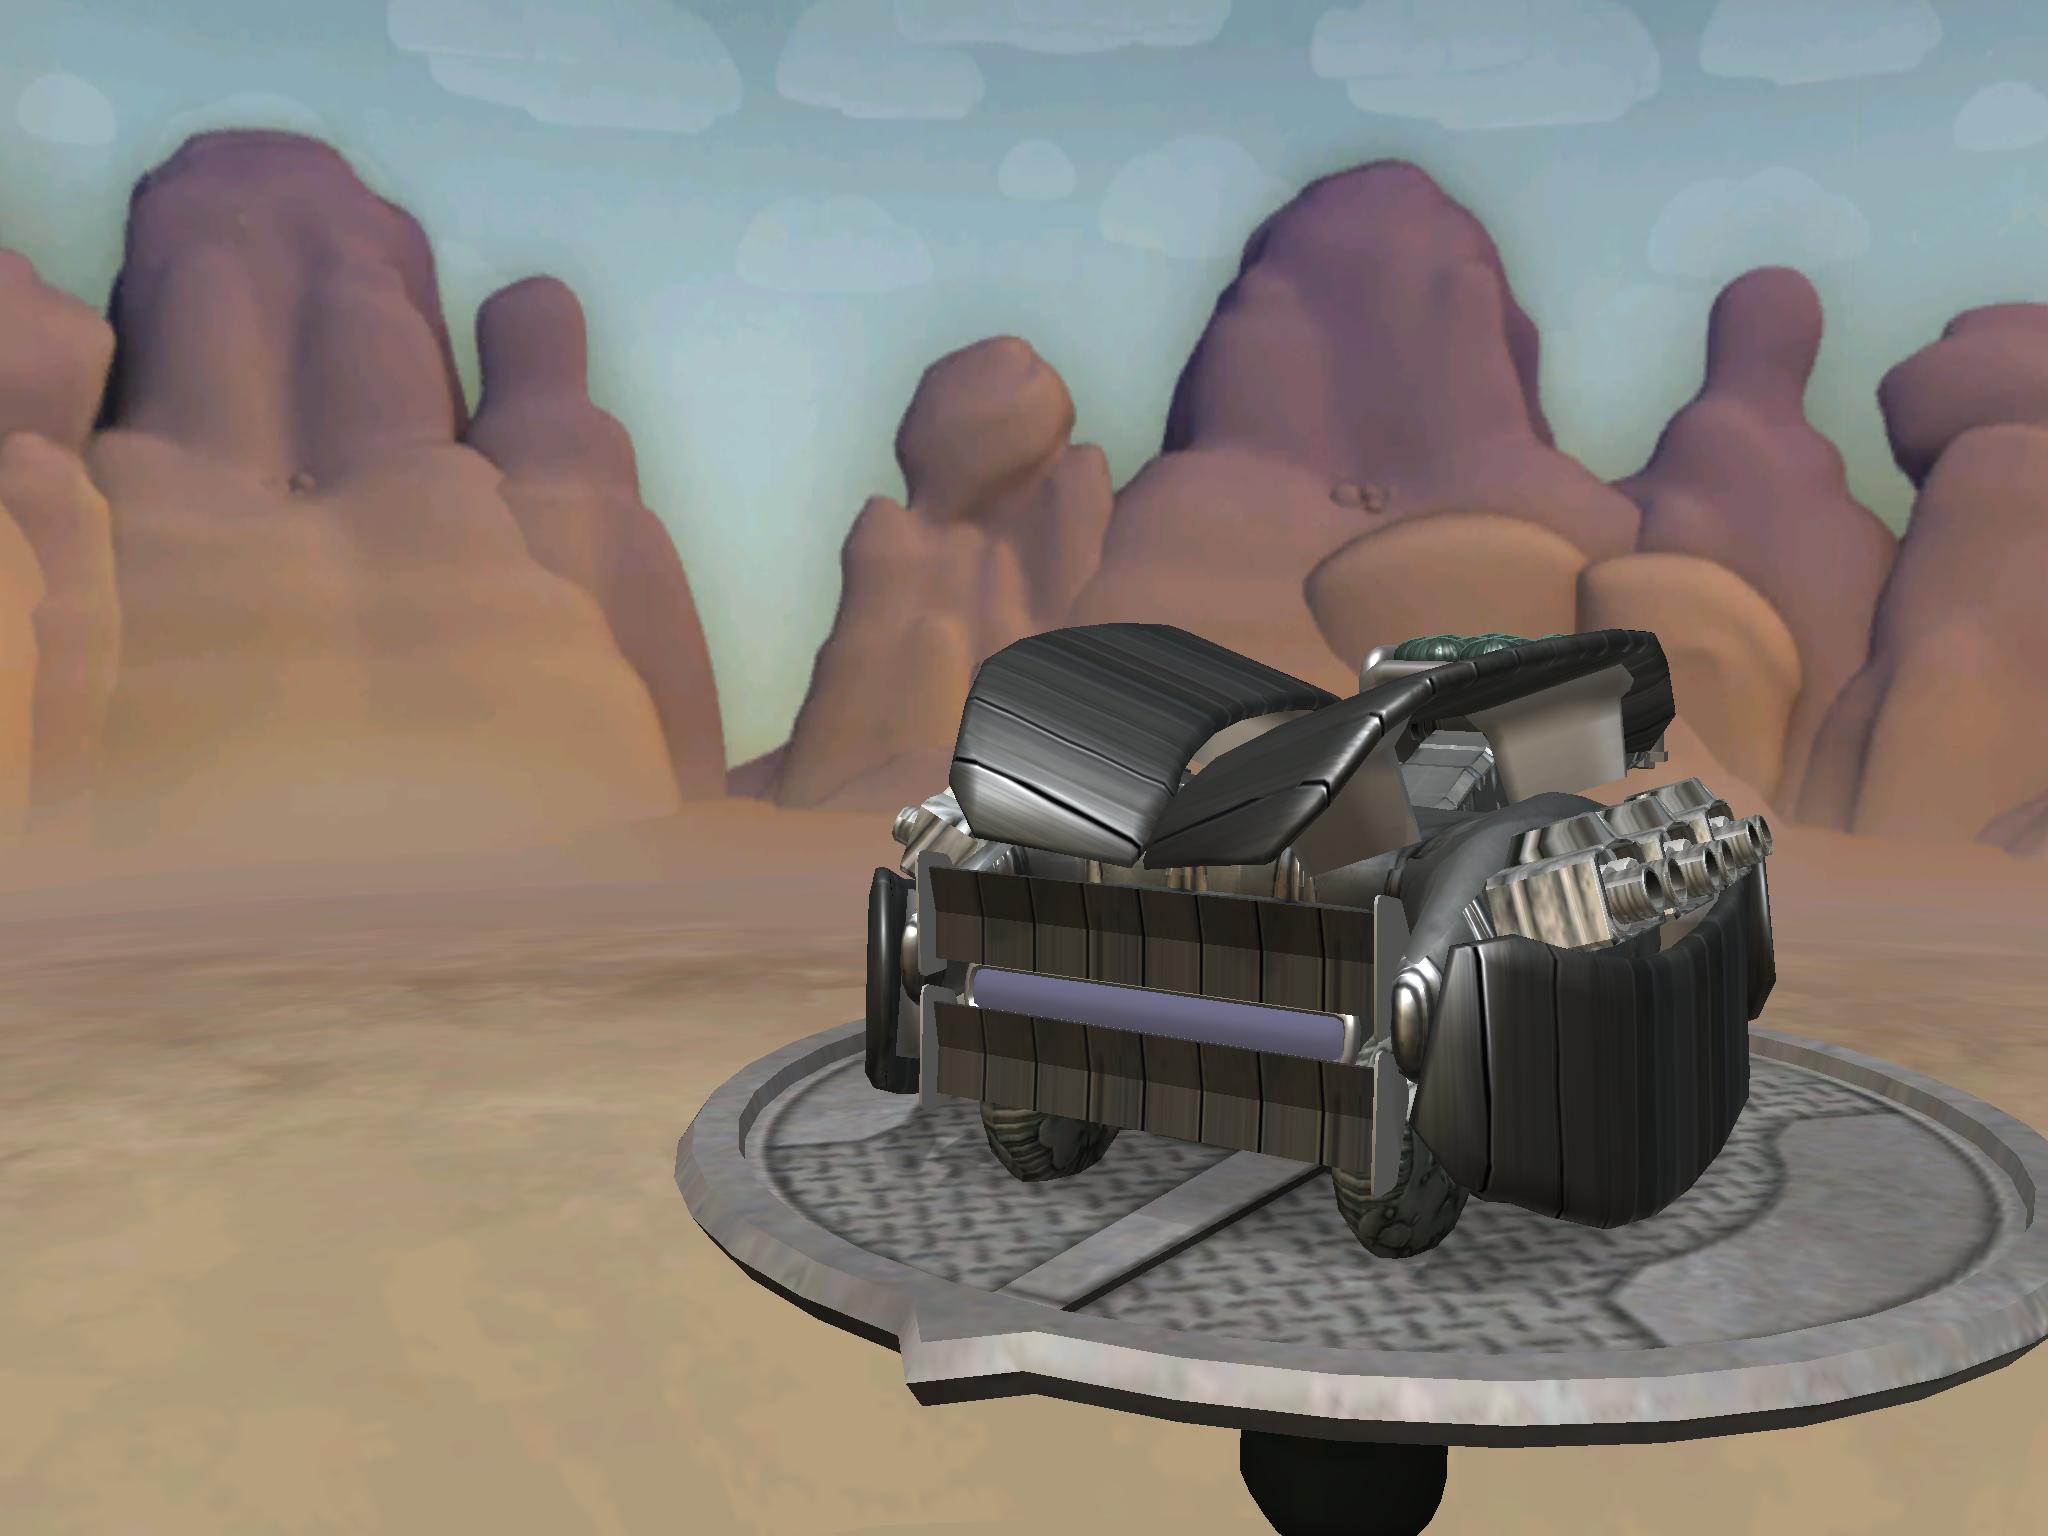 Vehiculo Bombardero Blindado[O8][T] Spore-23-04-2020-14-08-01